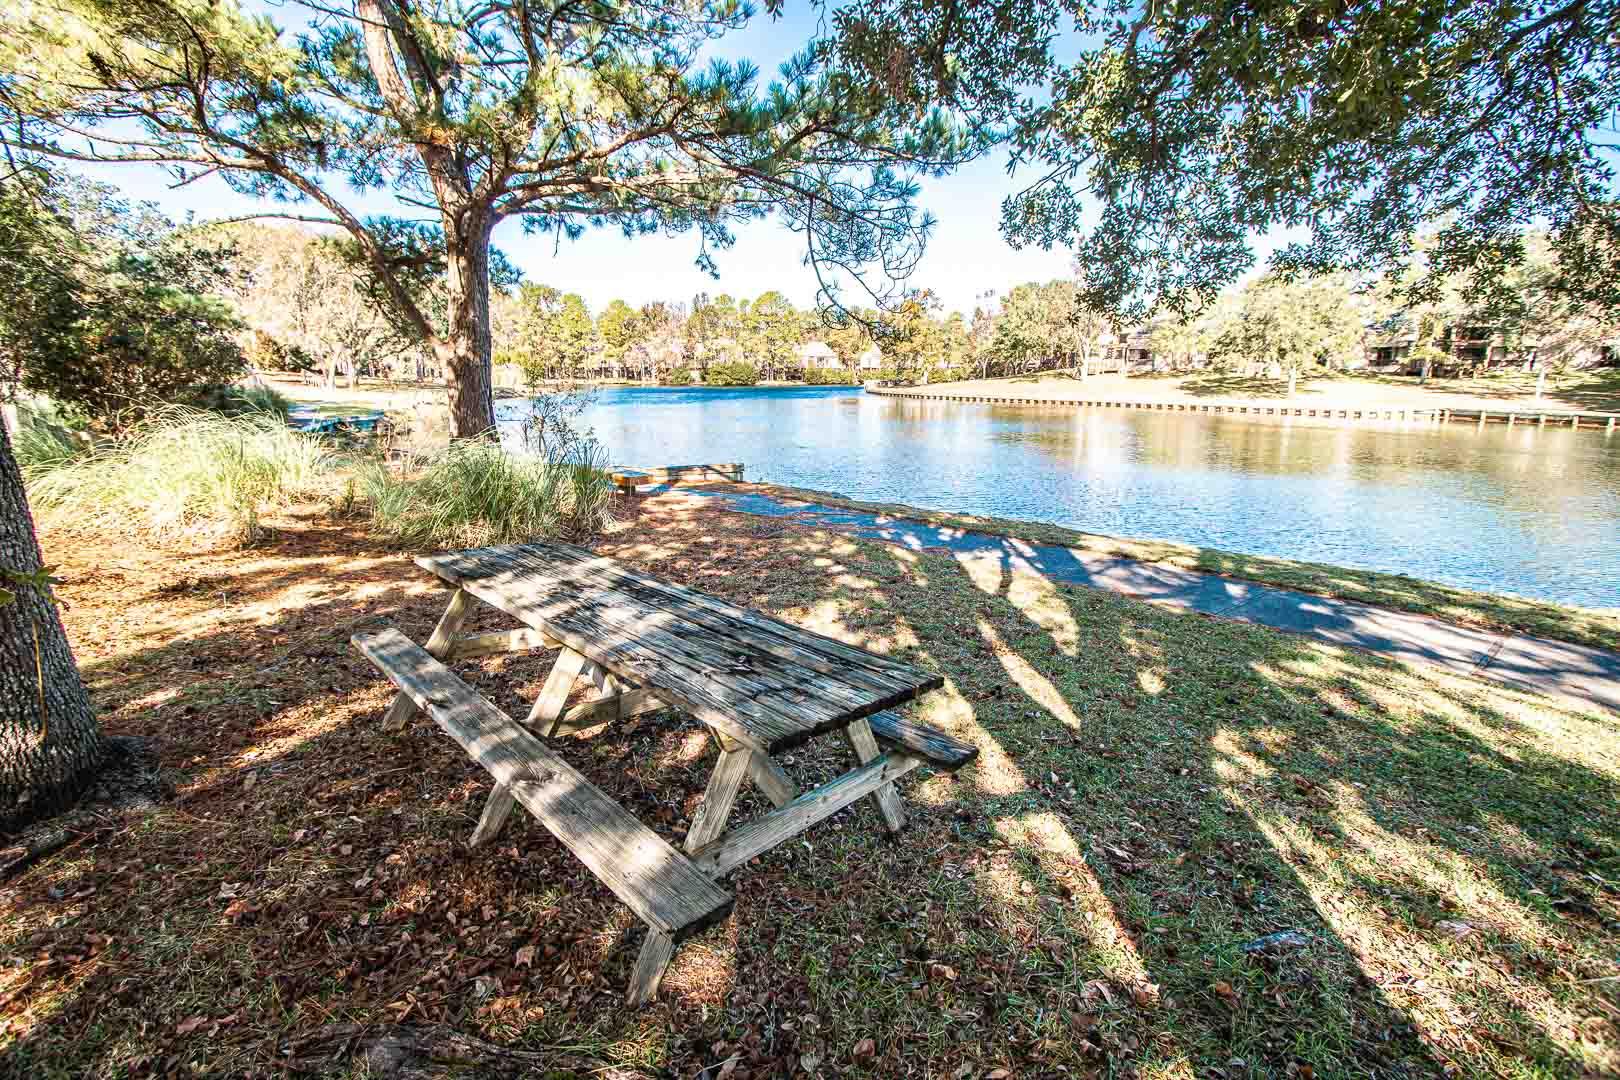 A relaxing picnic area at VRI's Sandcastle Village in New Bern, North Carolina.